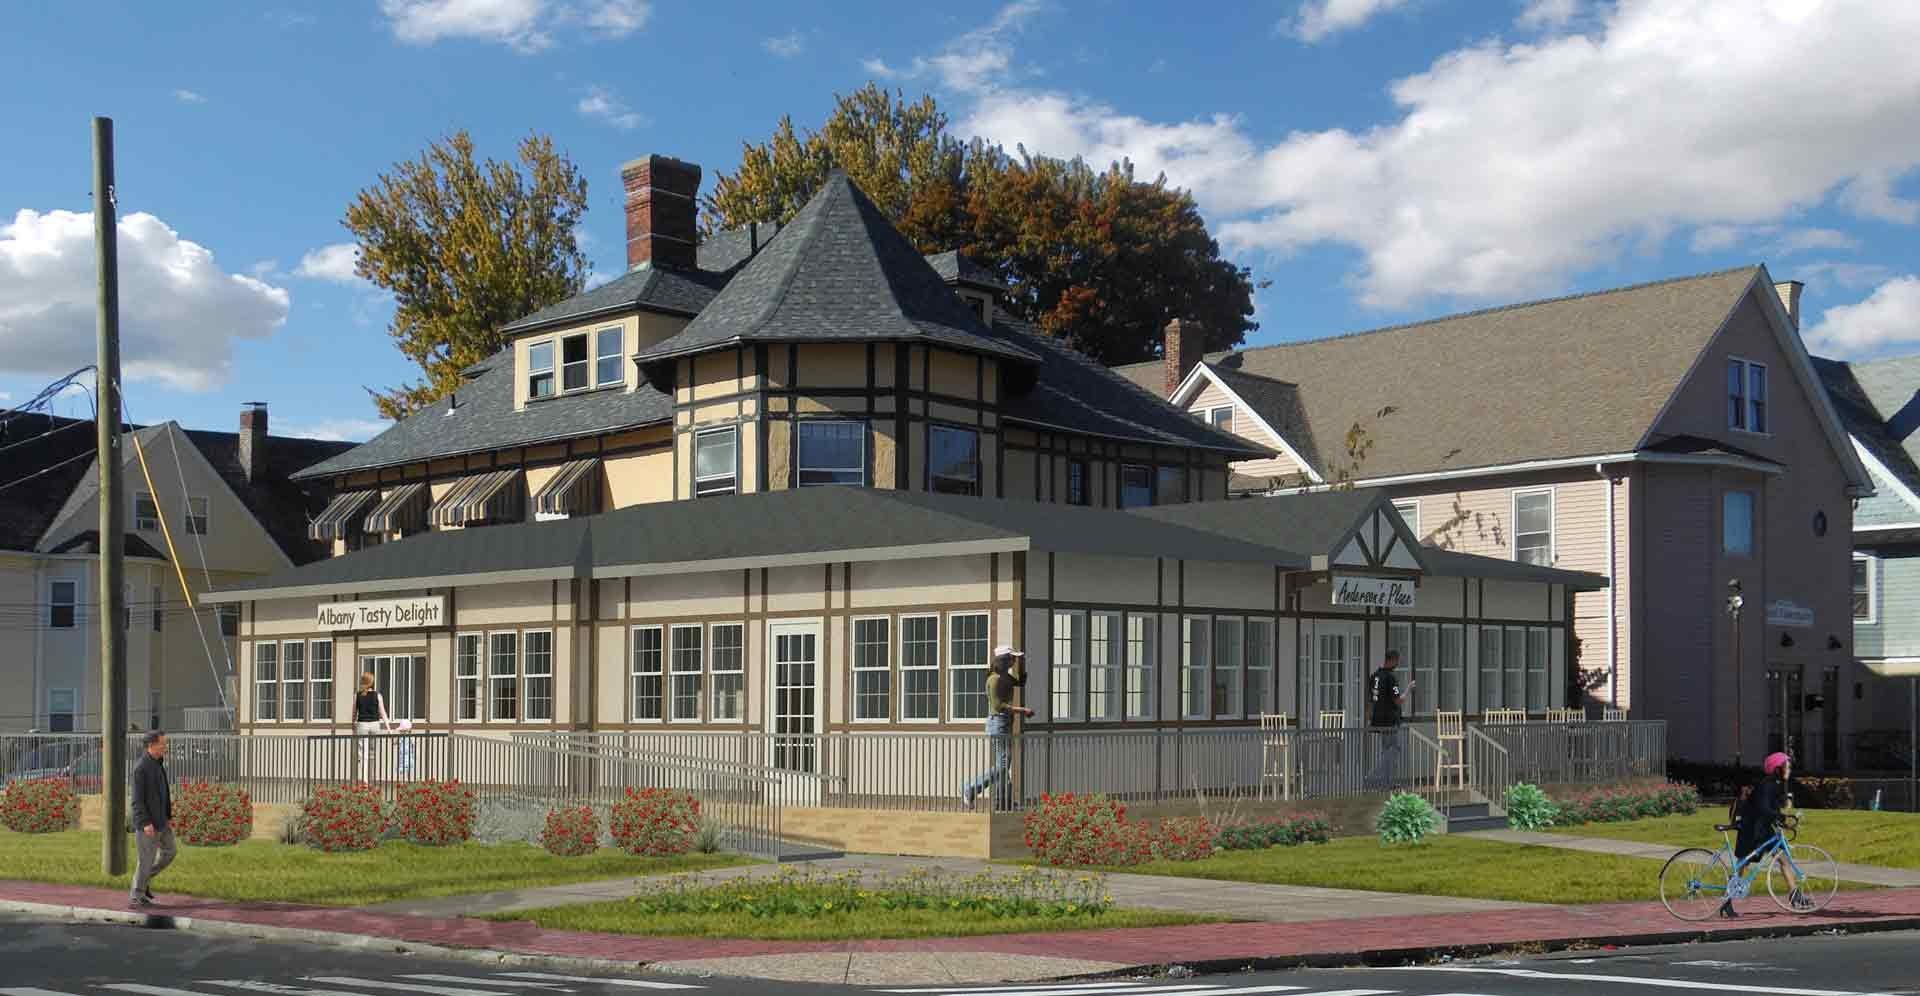 817-Albany-Corner-New-Proposed-2-12-16.jpg